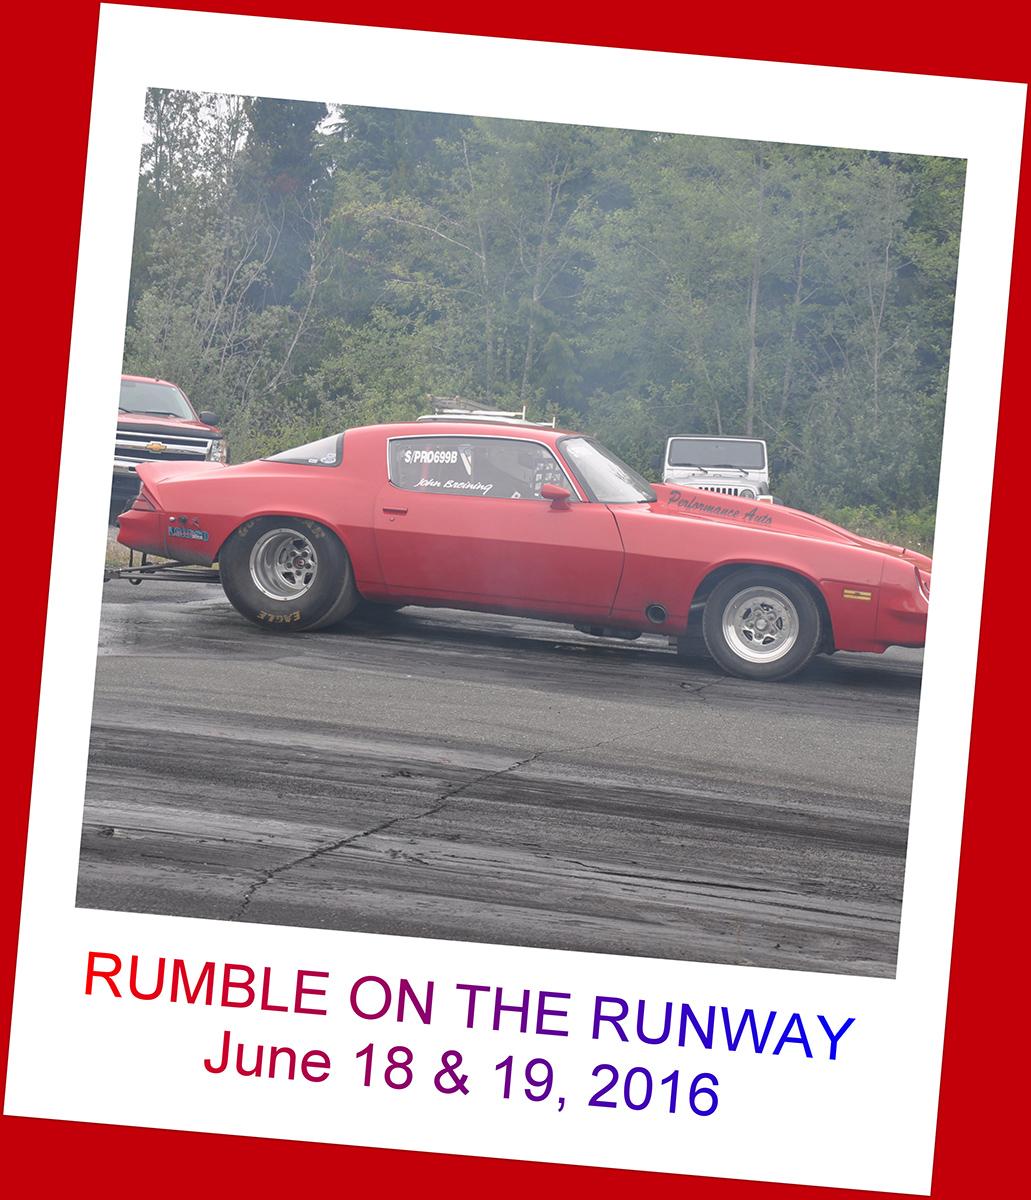 Rumble on the Runway June 18 & 19, 2016 991